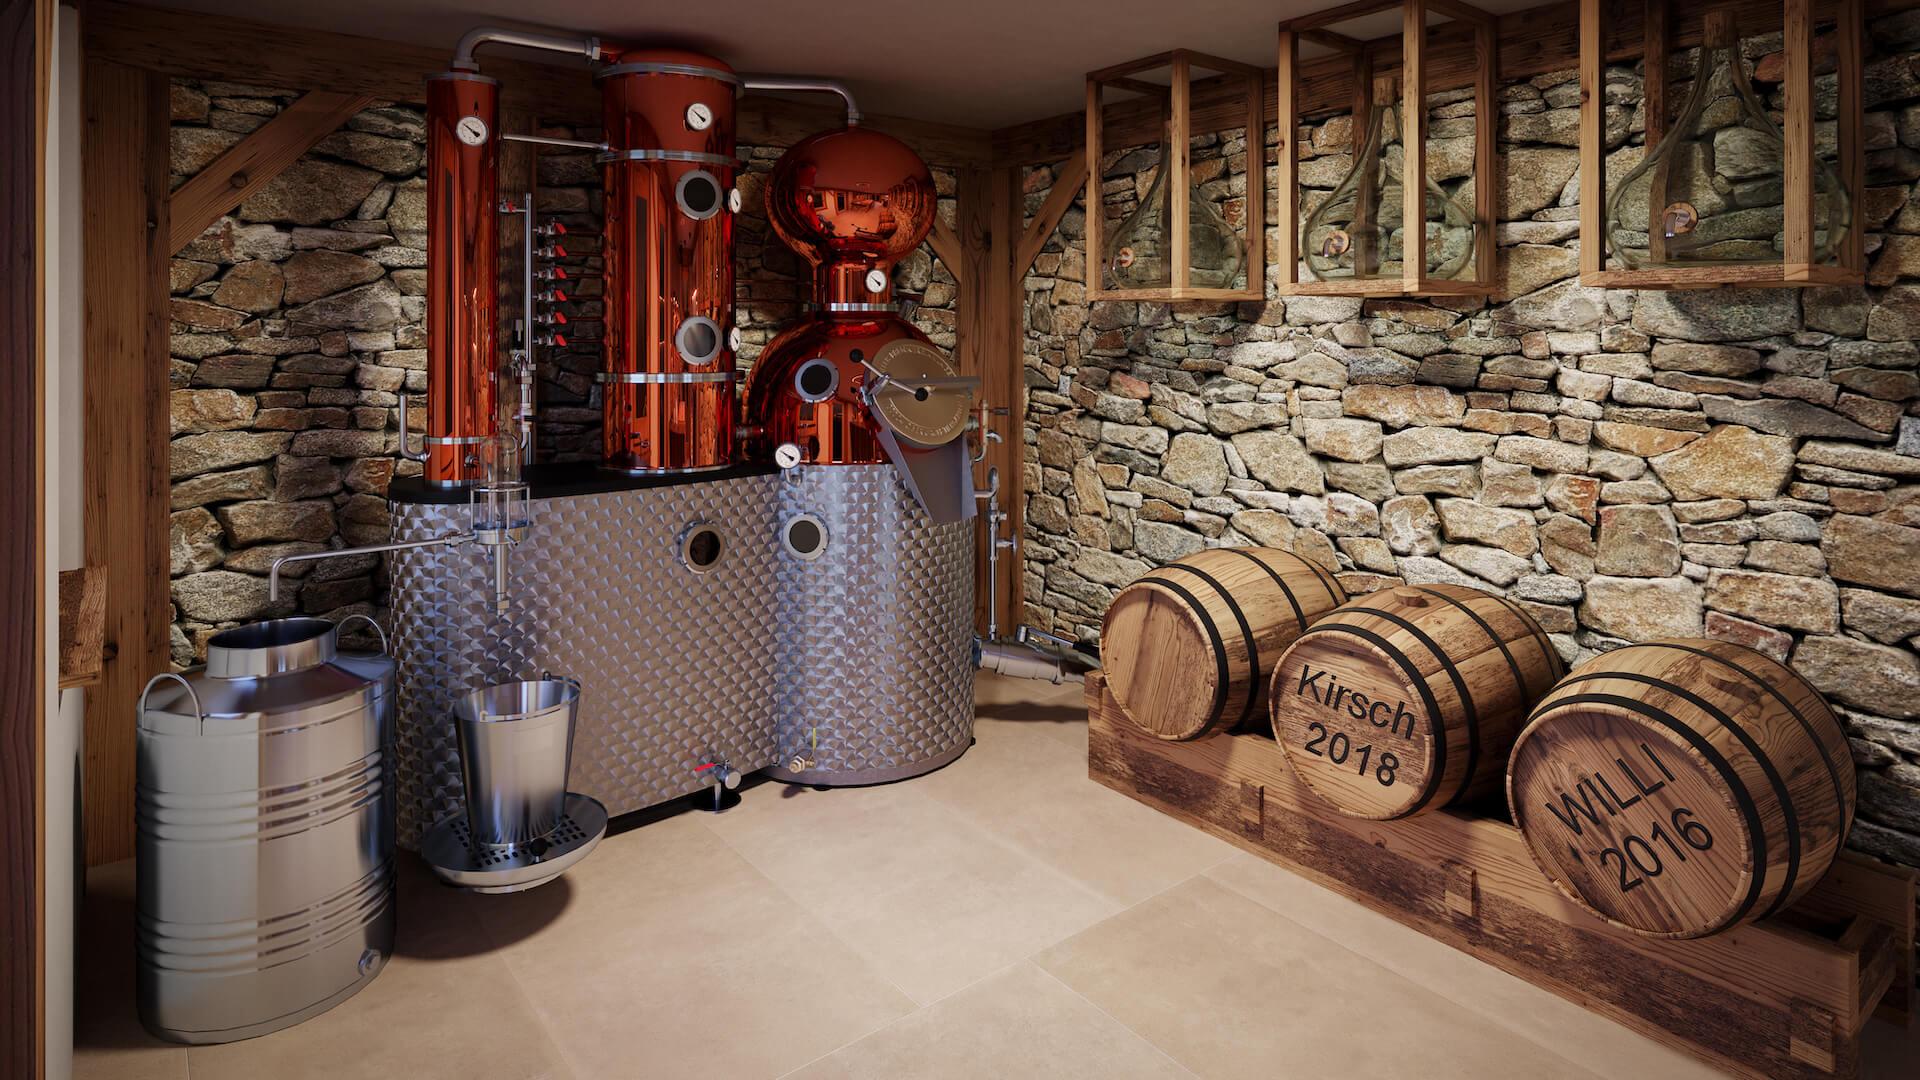 Photorealistic Interior 3D Rendering of the Distillery's Tasting Room